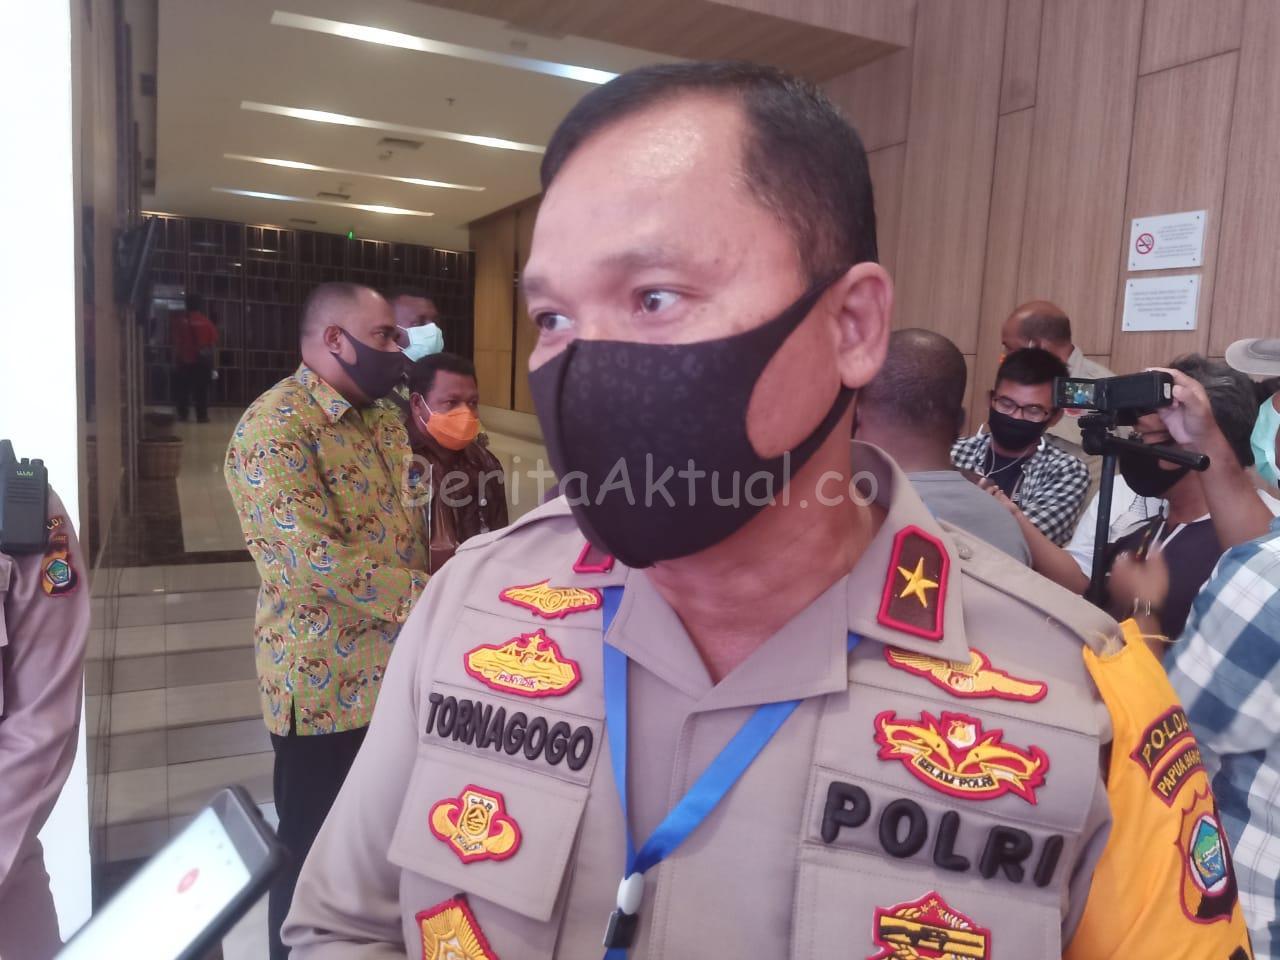 Polda PB Bentuk Tim Khusus Kejar Pelaku Begal Dan Curas di Manokwari Dan Sorong 25 IMG 20200424 WA0044